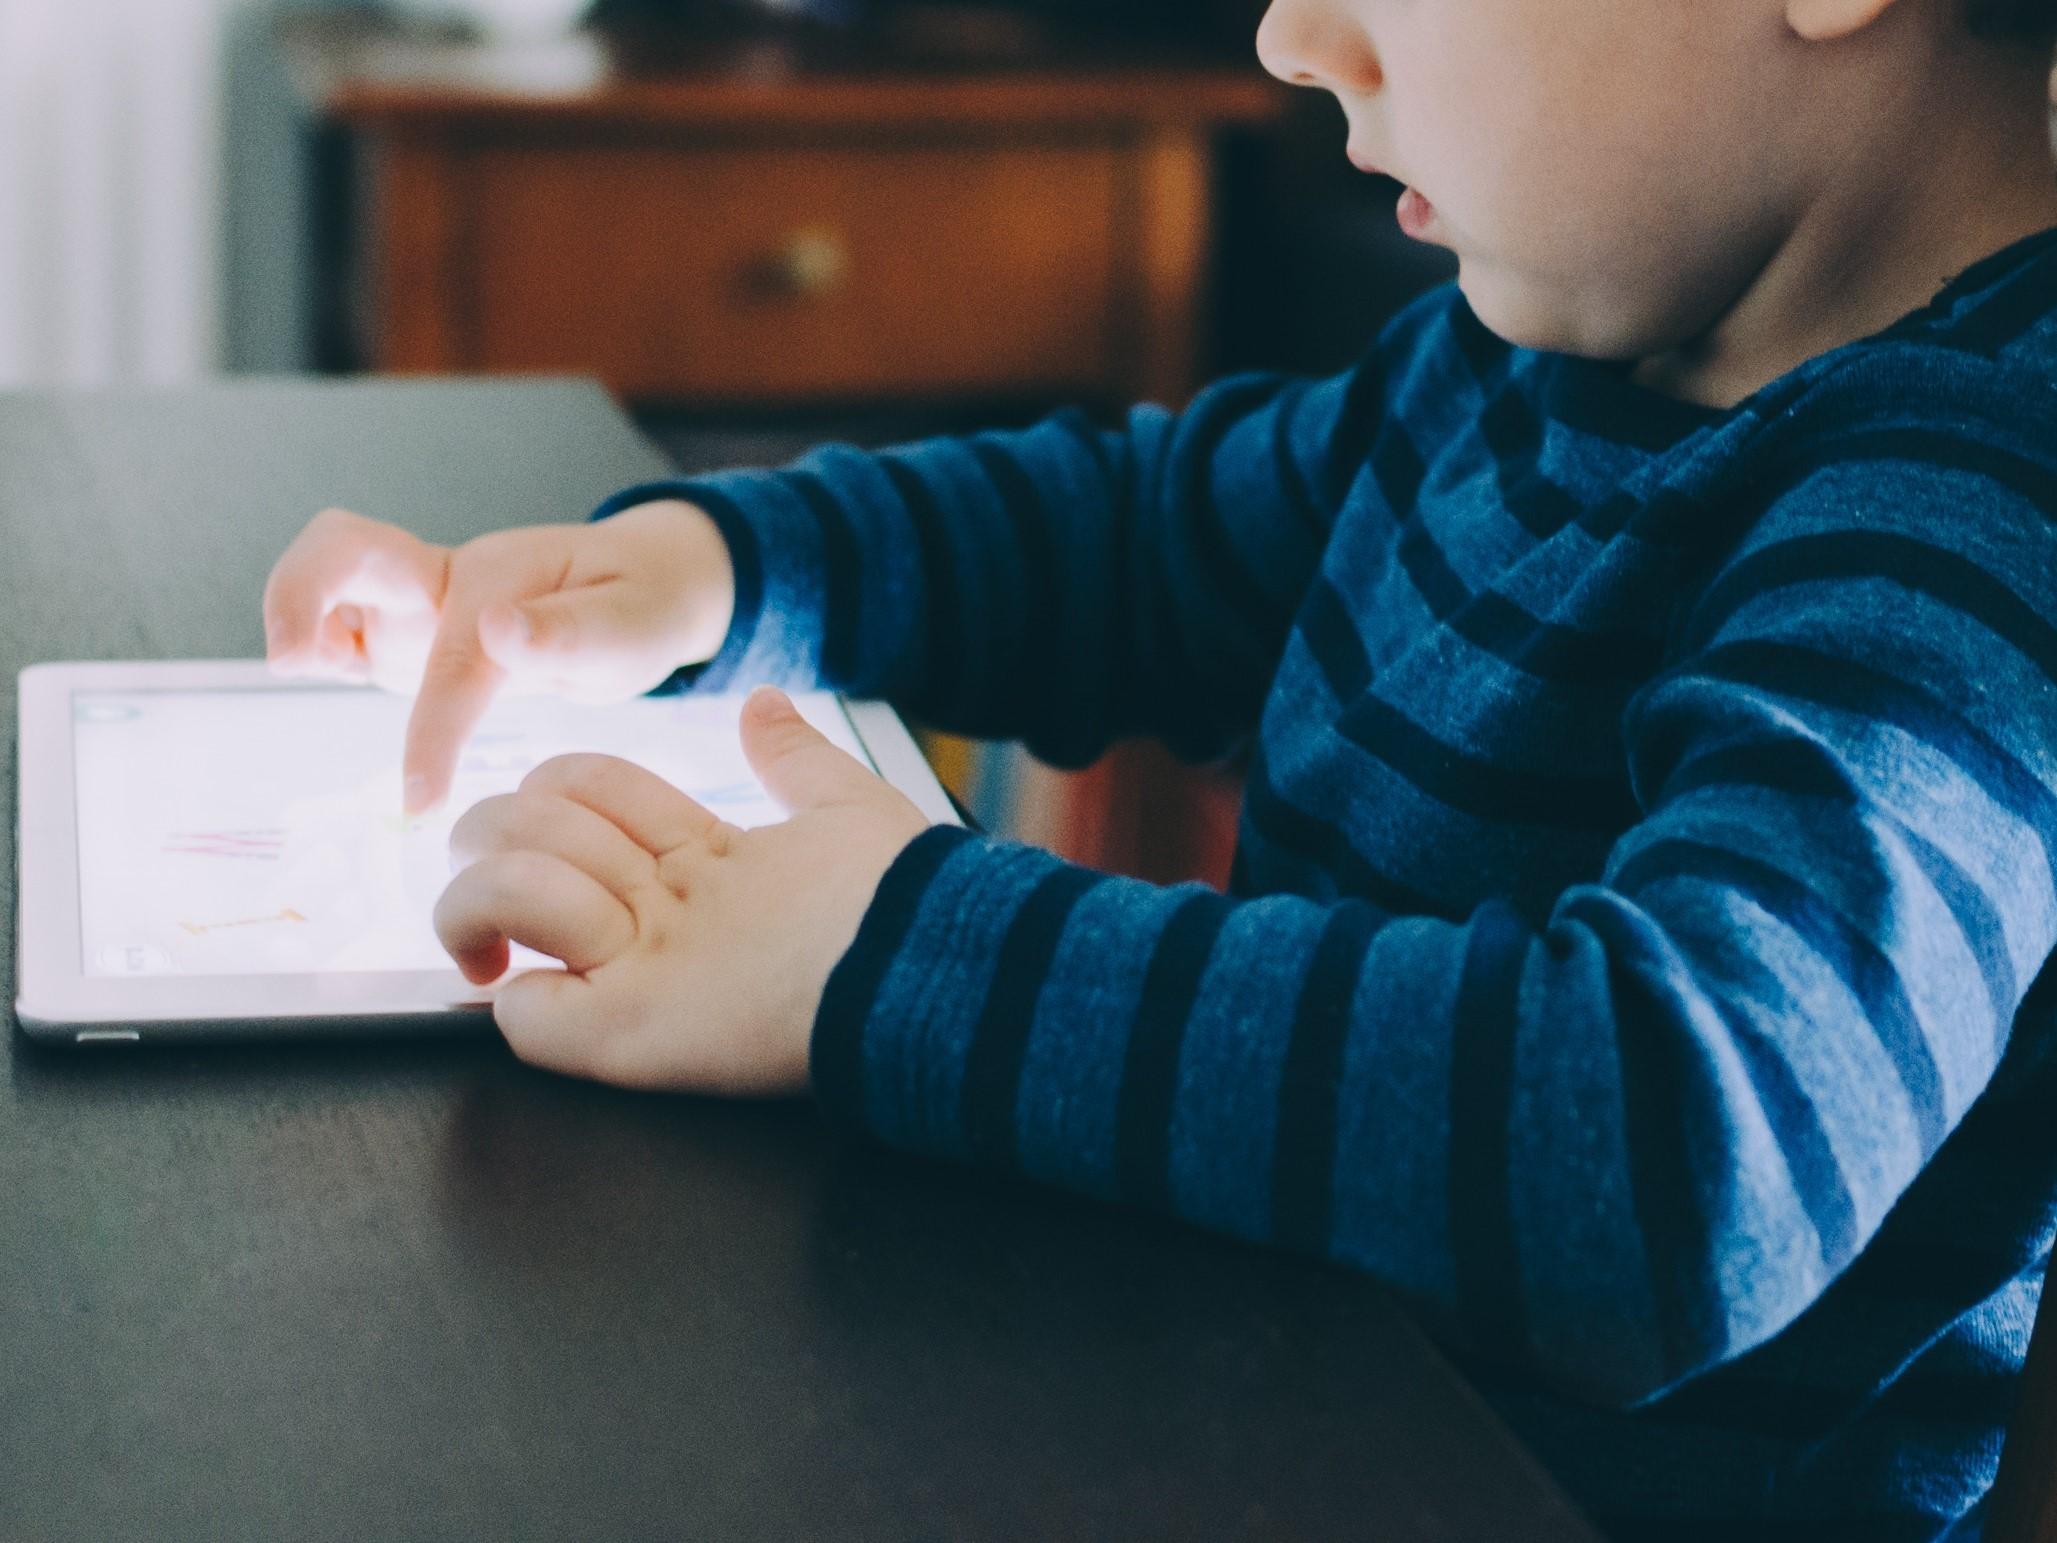 A child using an iPad. Kelly Sikkema/Unsplash